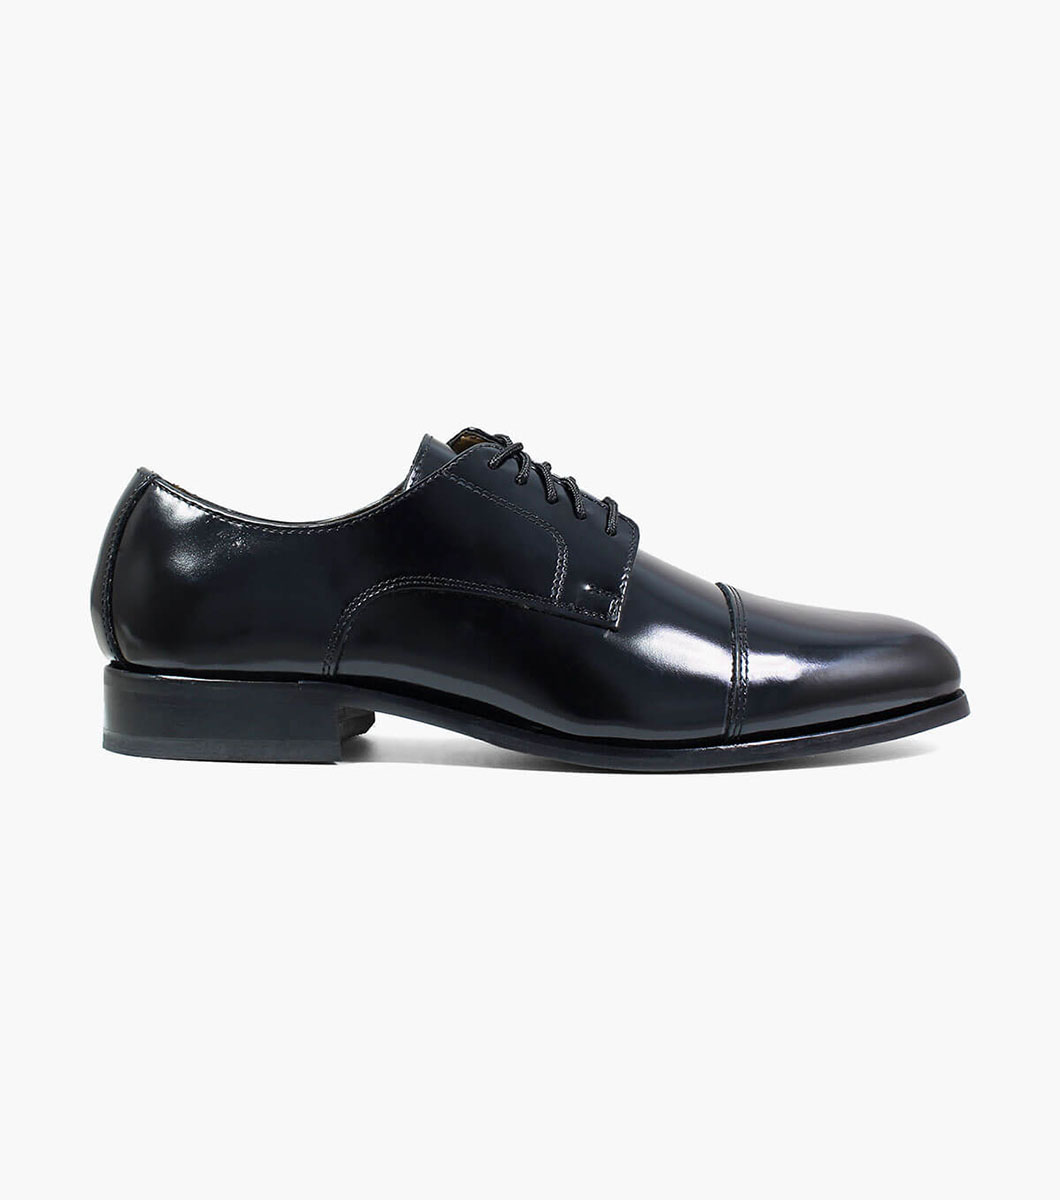 Mens Dress Shoes Black Cap Toe Oxford Florsheim Broxton